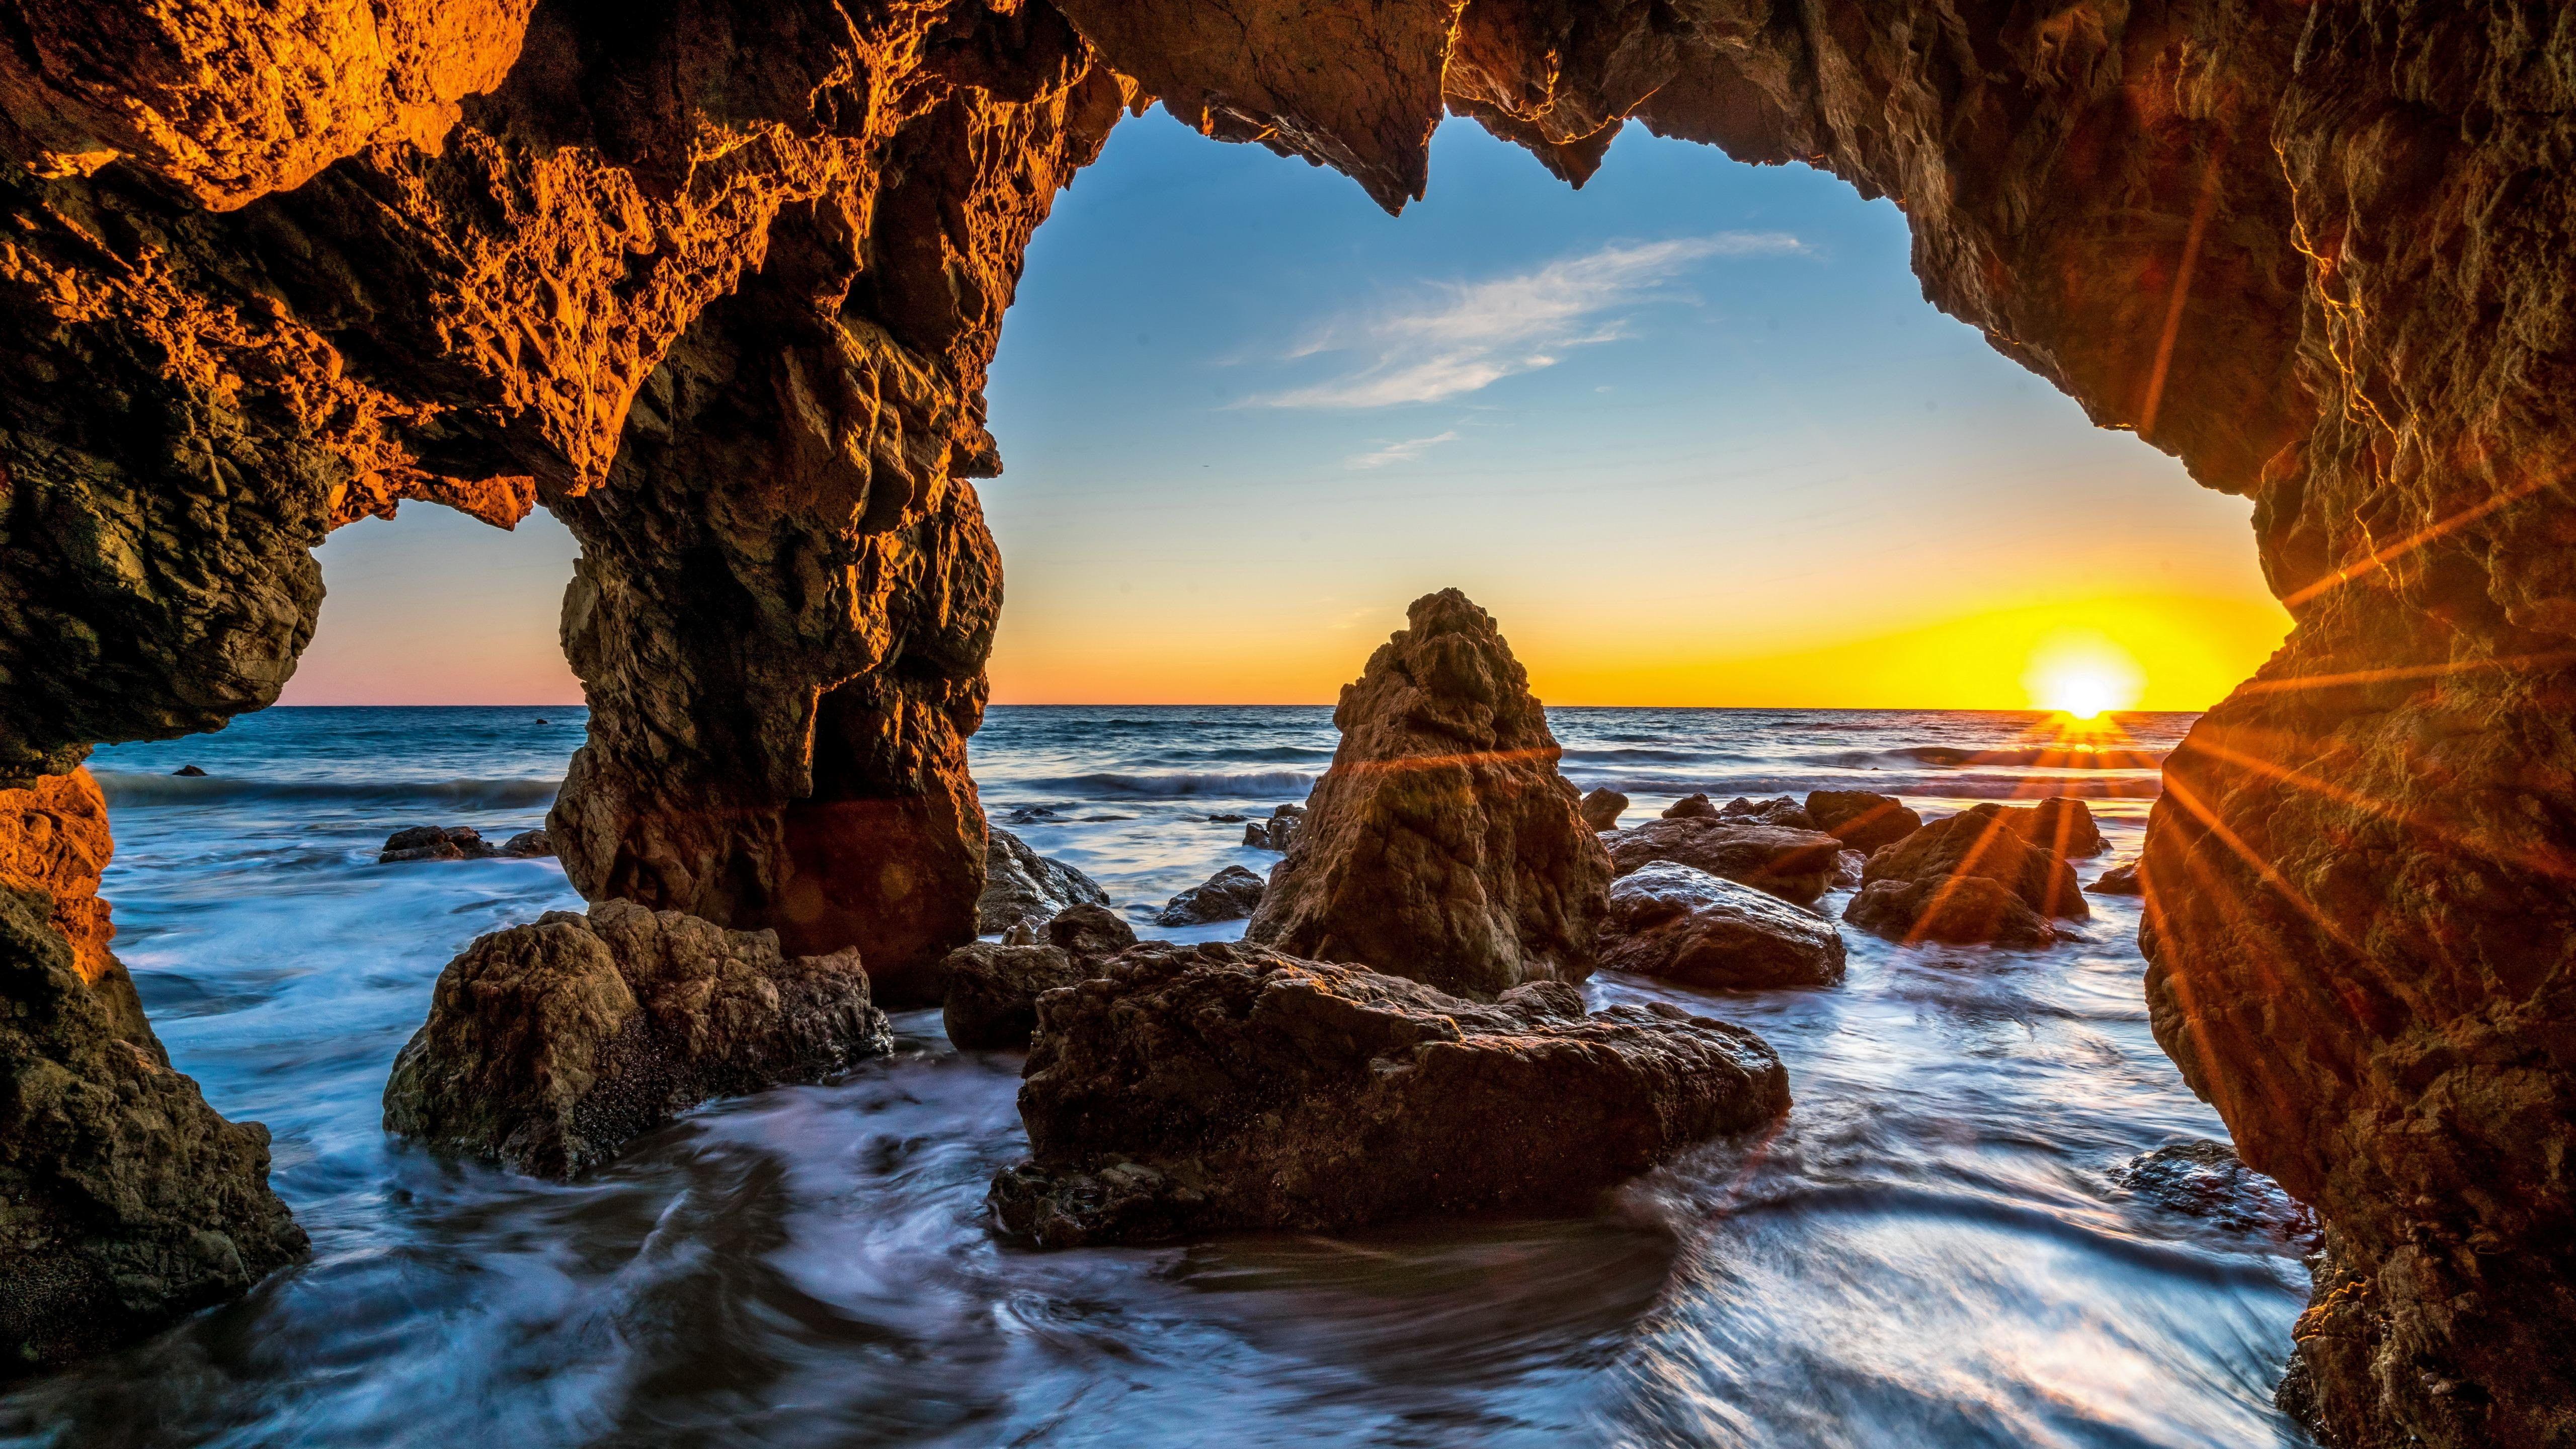 Natural Arch Malibu California Malibu Beach United States El Matador State Beach Epic Malibu Sea Cave Ocean Landscape Landscape Photography Landscape Walls